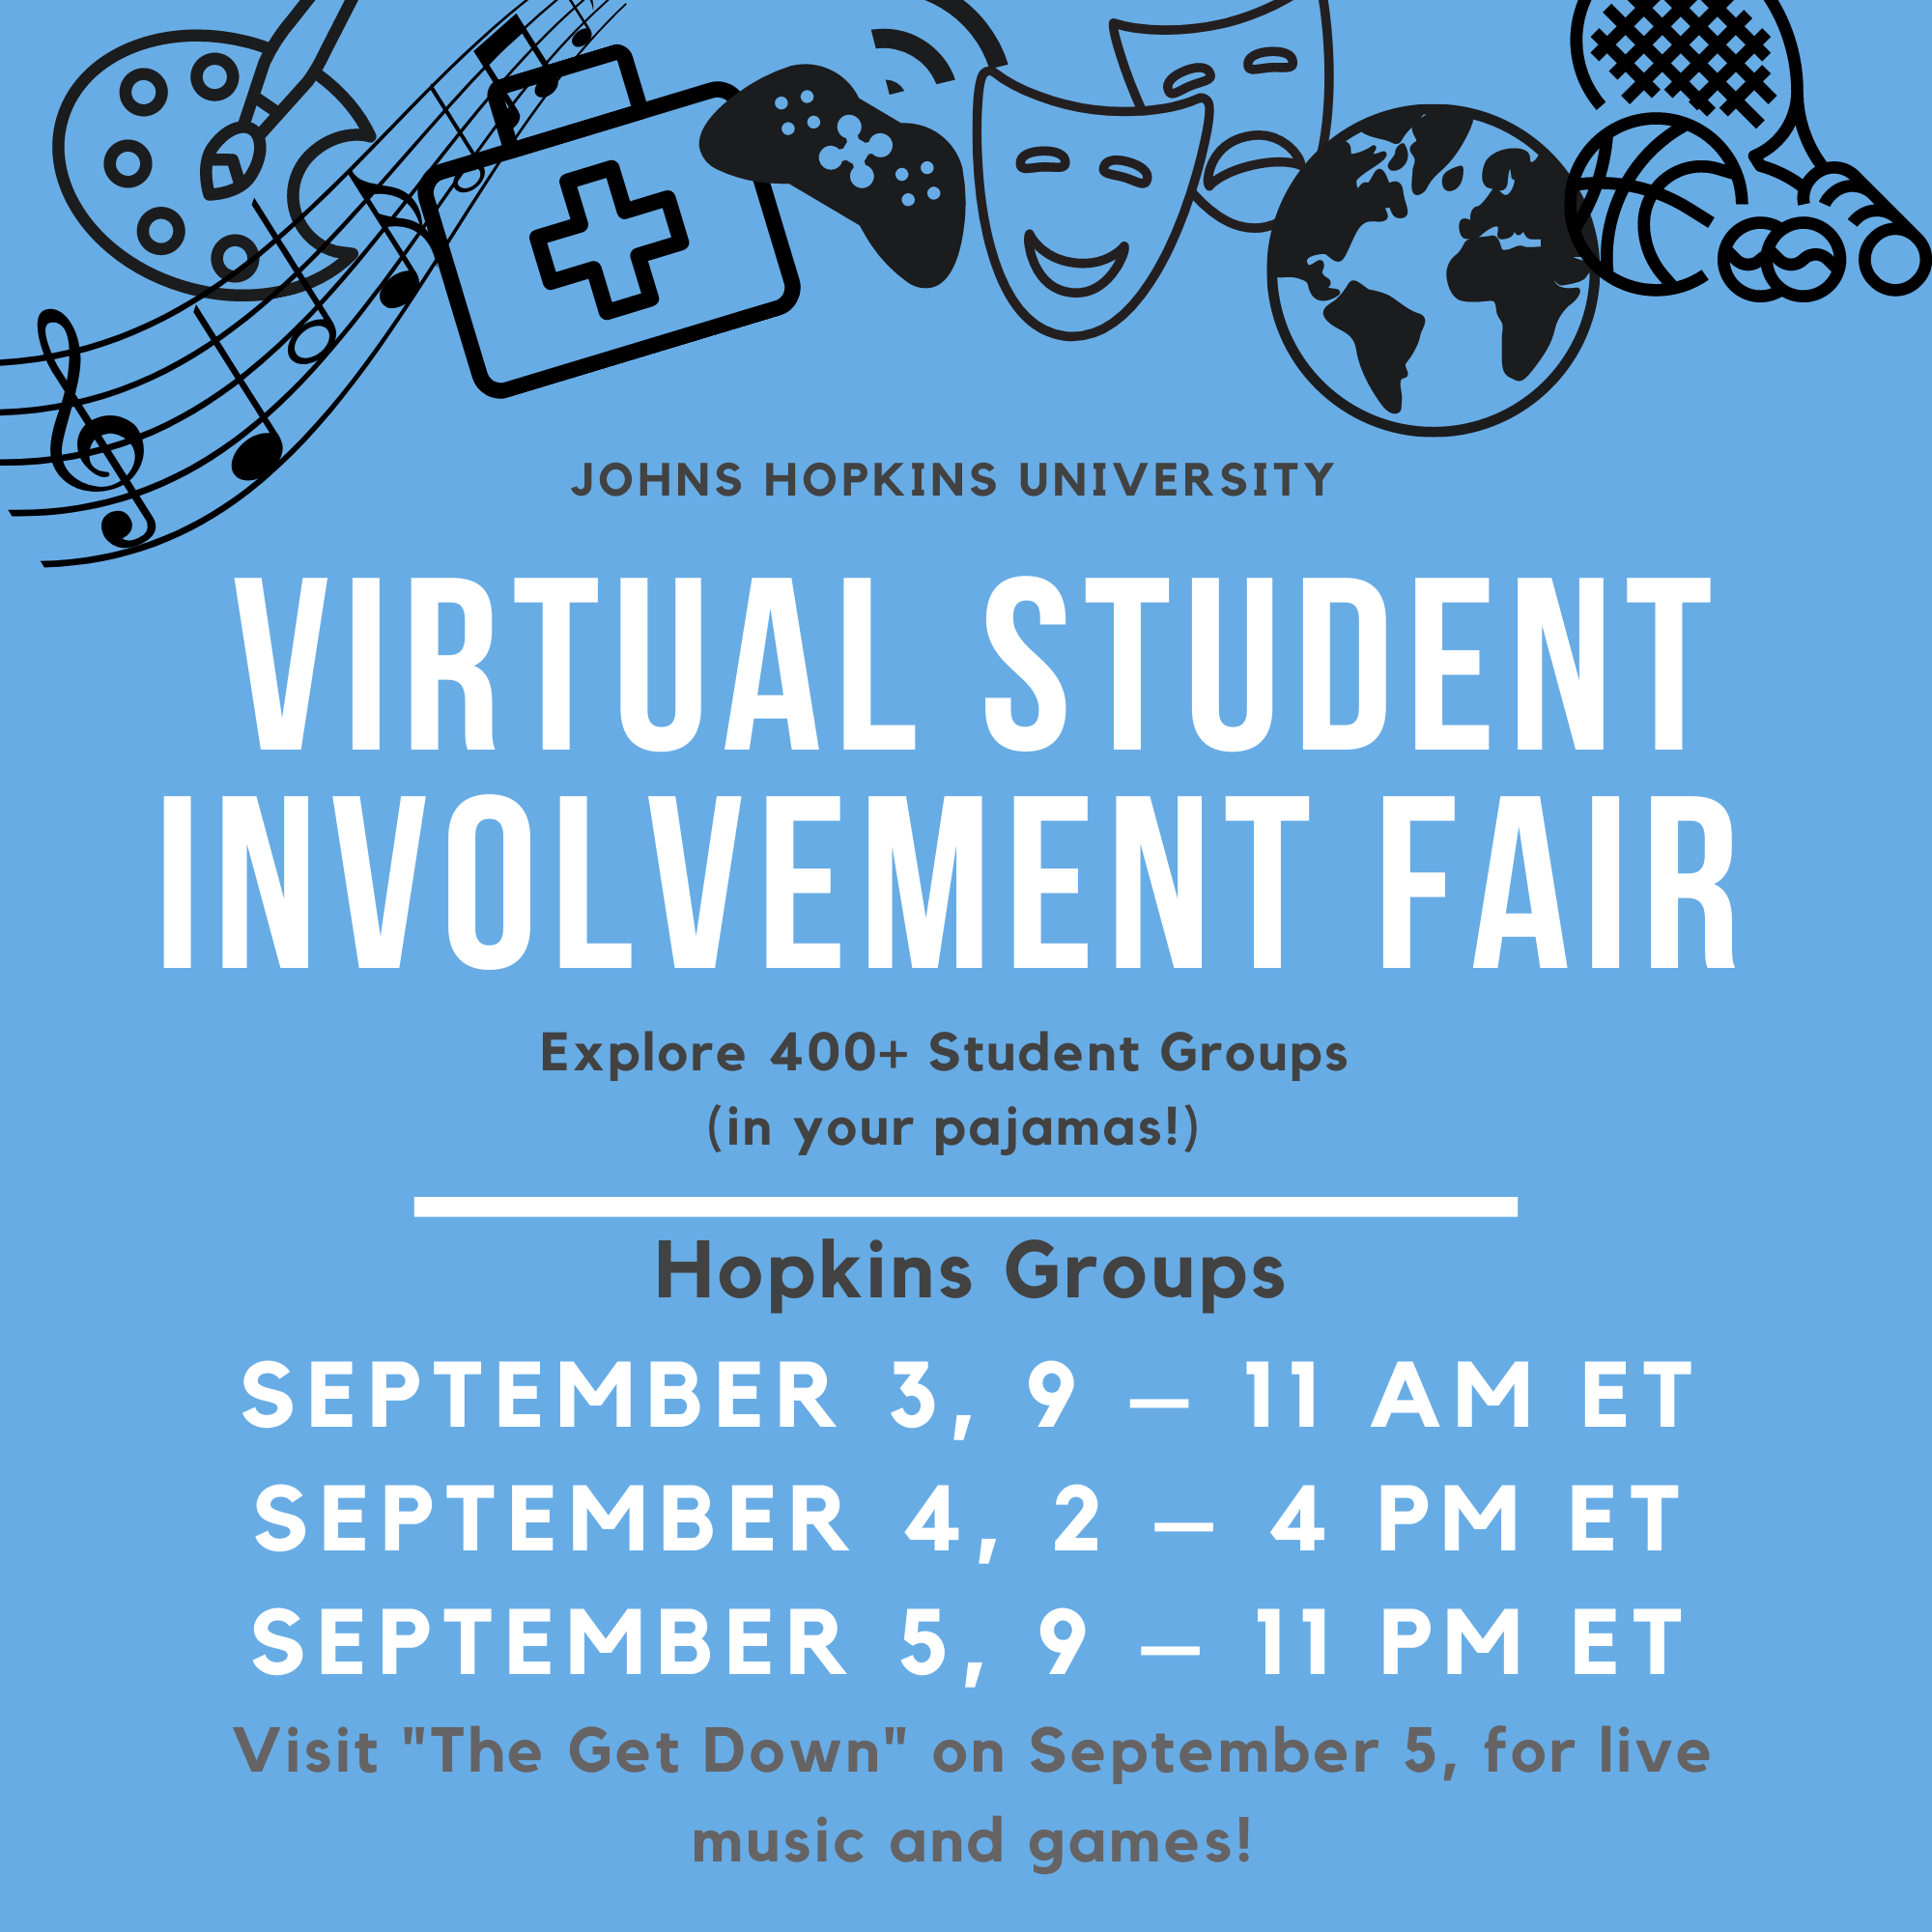 Student Involvement Fair 2020